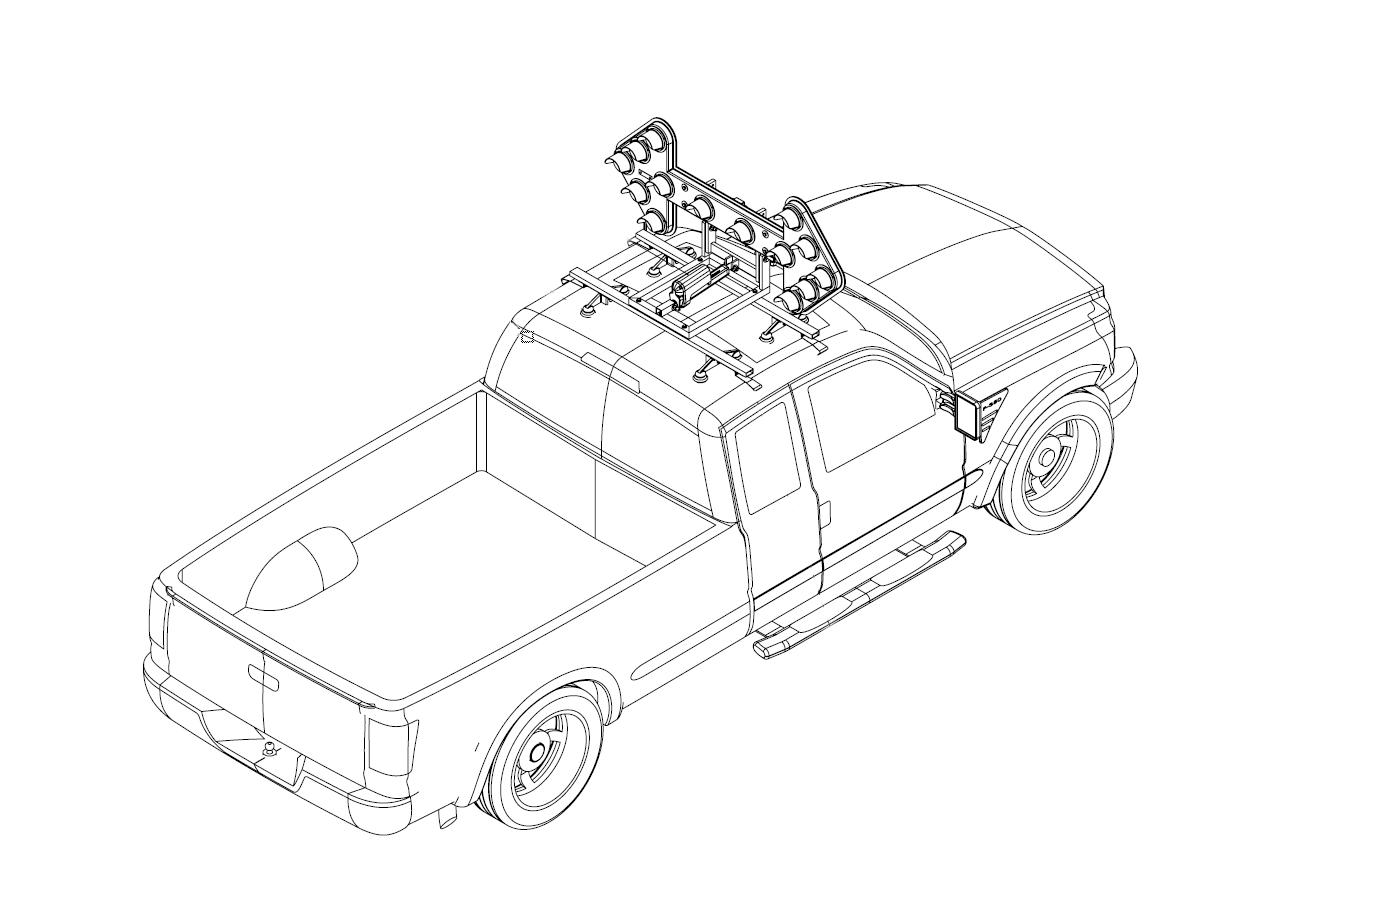 Vm 14v 14 Light Vehicle Mounted Arrowboard